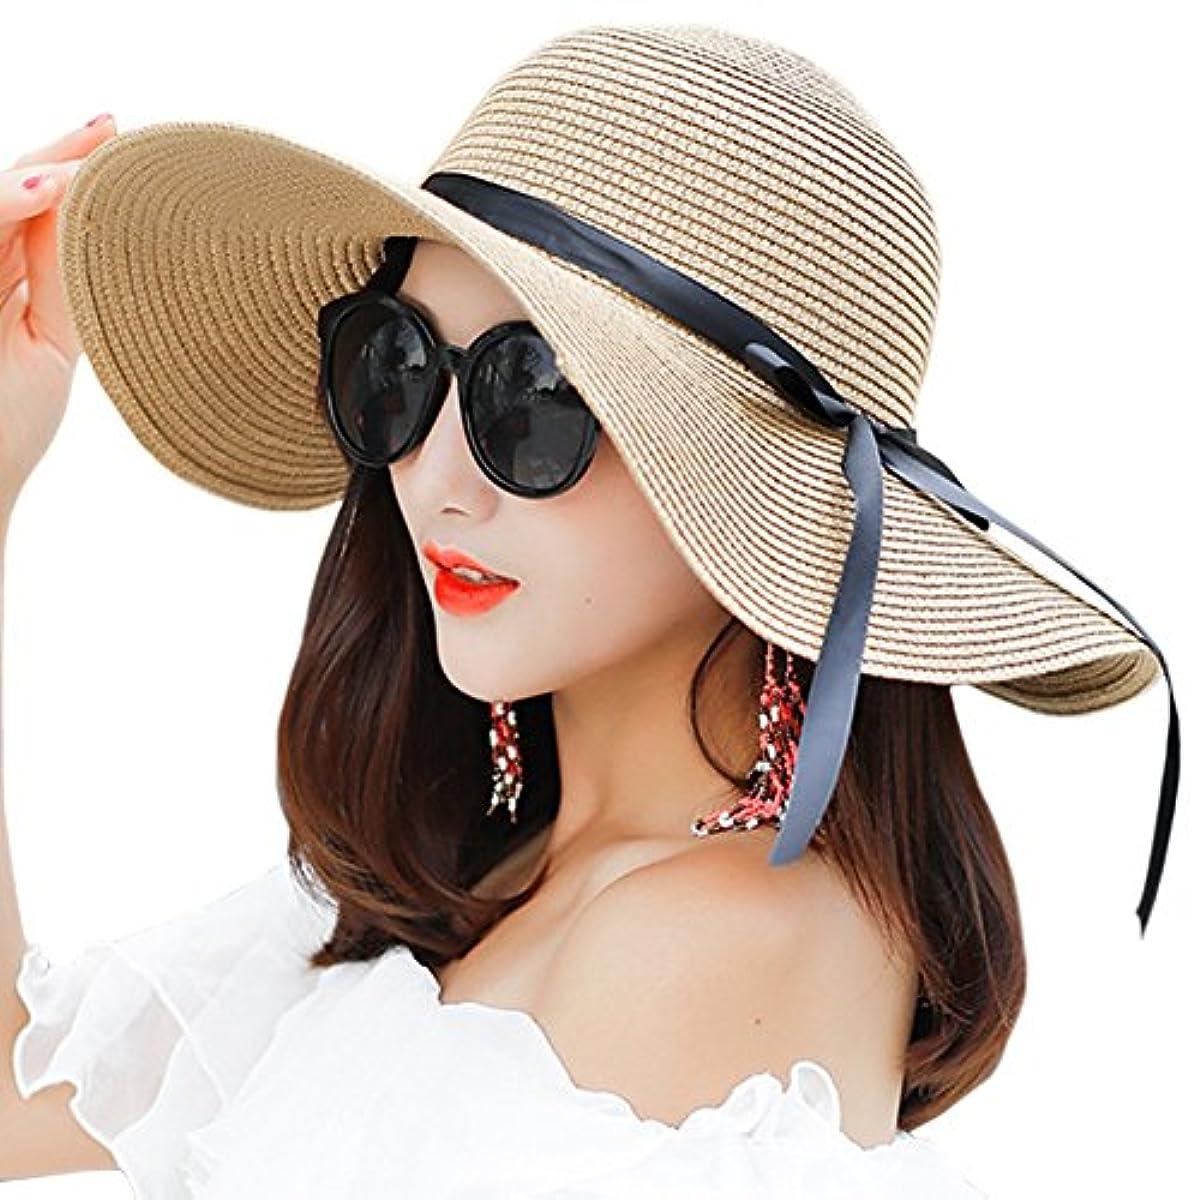 7504d77b Details about Women's Big Brim Sun Hat Floppy Foldable Bowknot Straw Hat  Summer Beach Hat